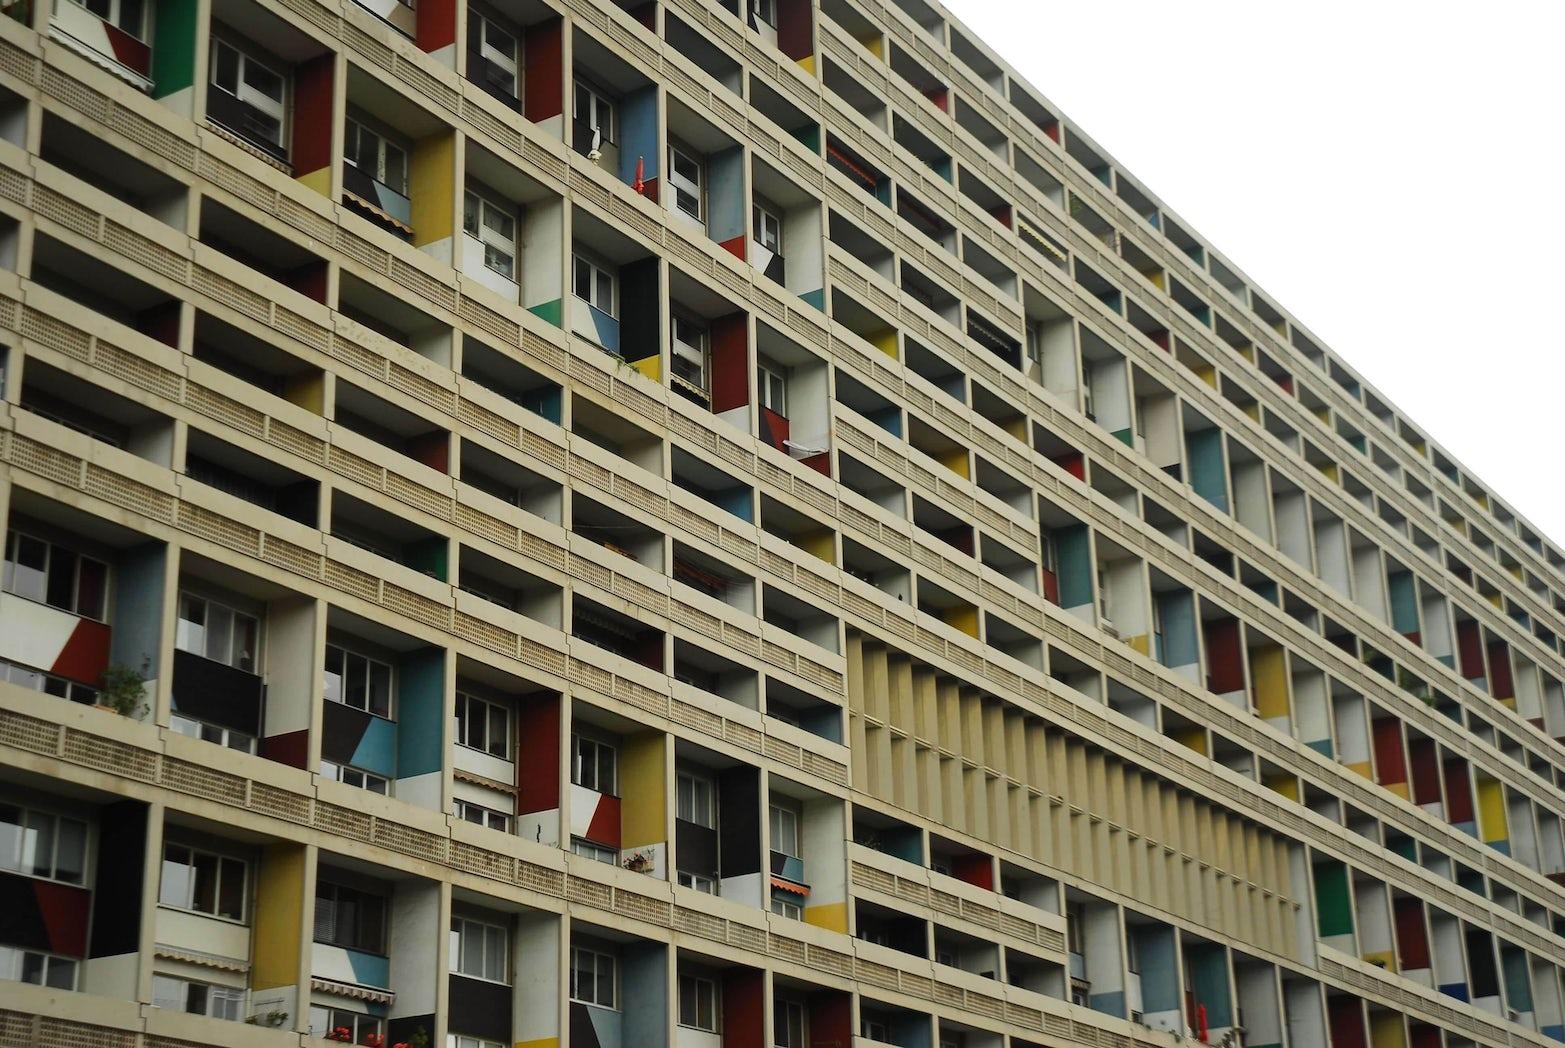 Corbusier Benton